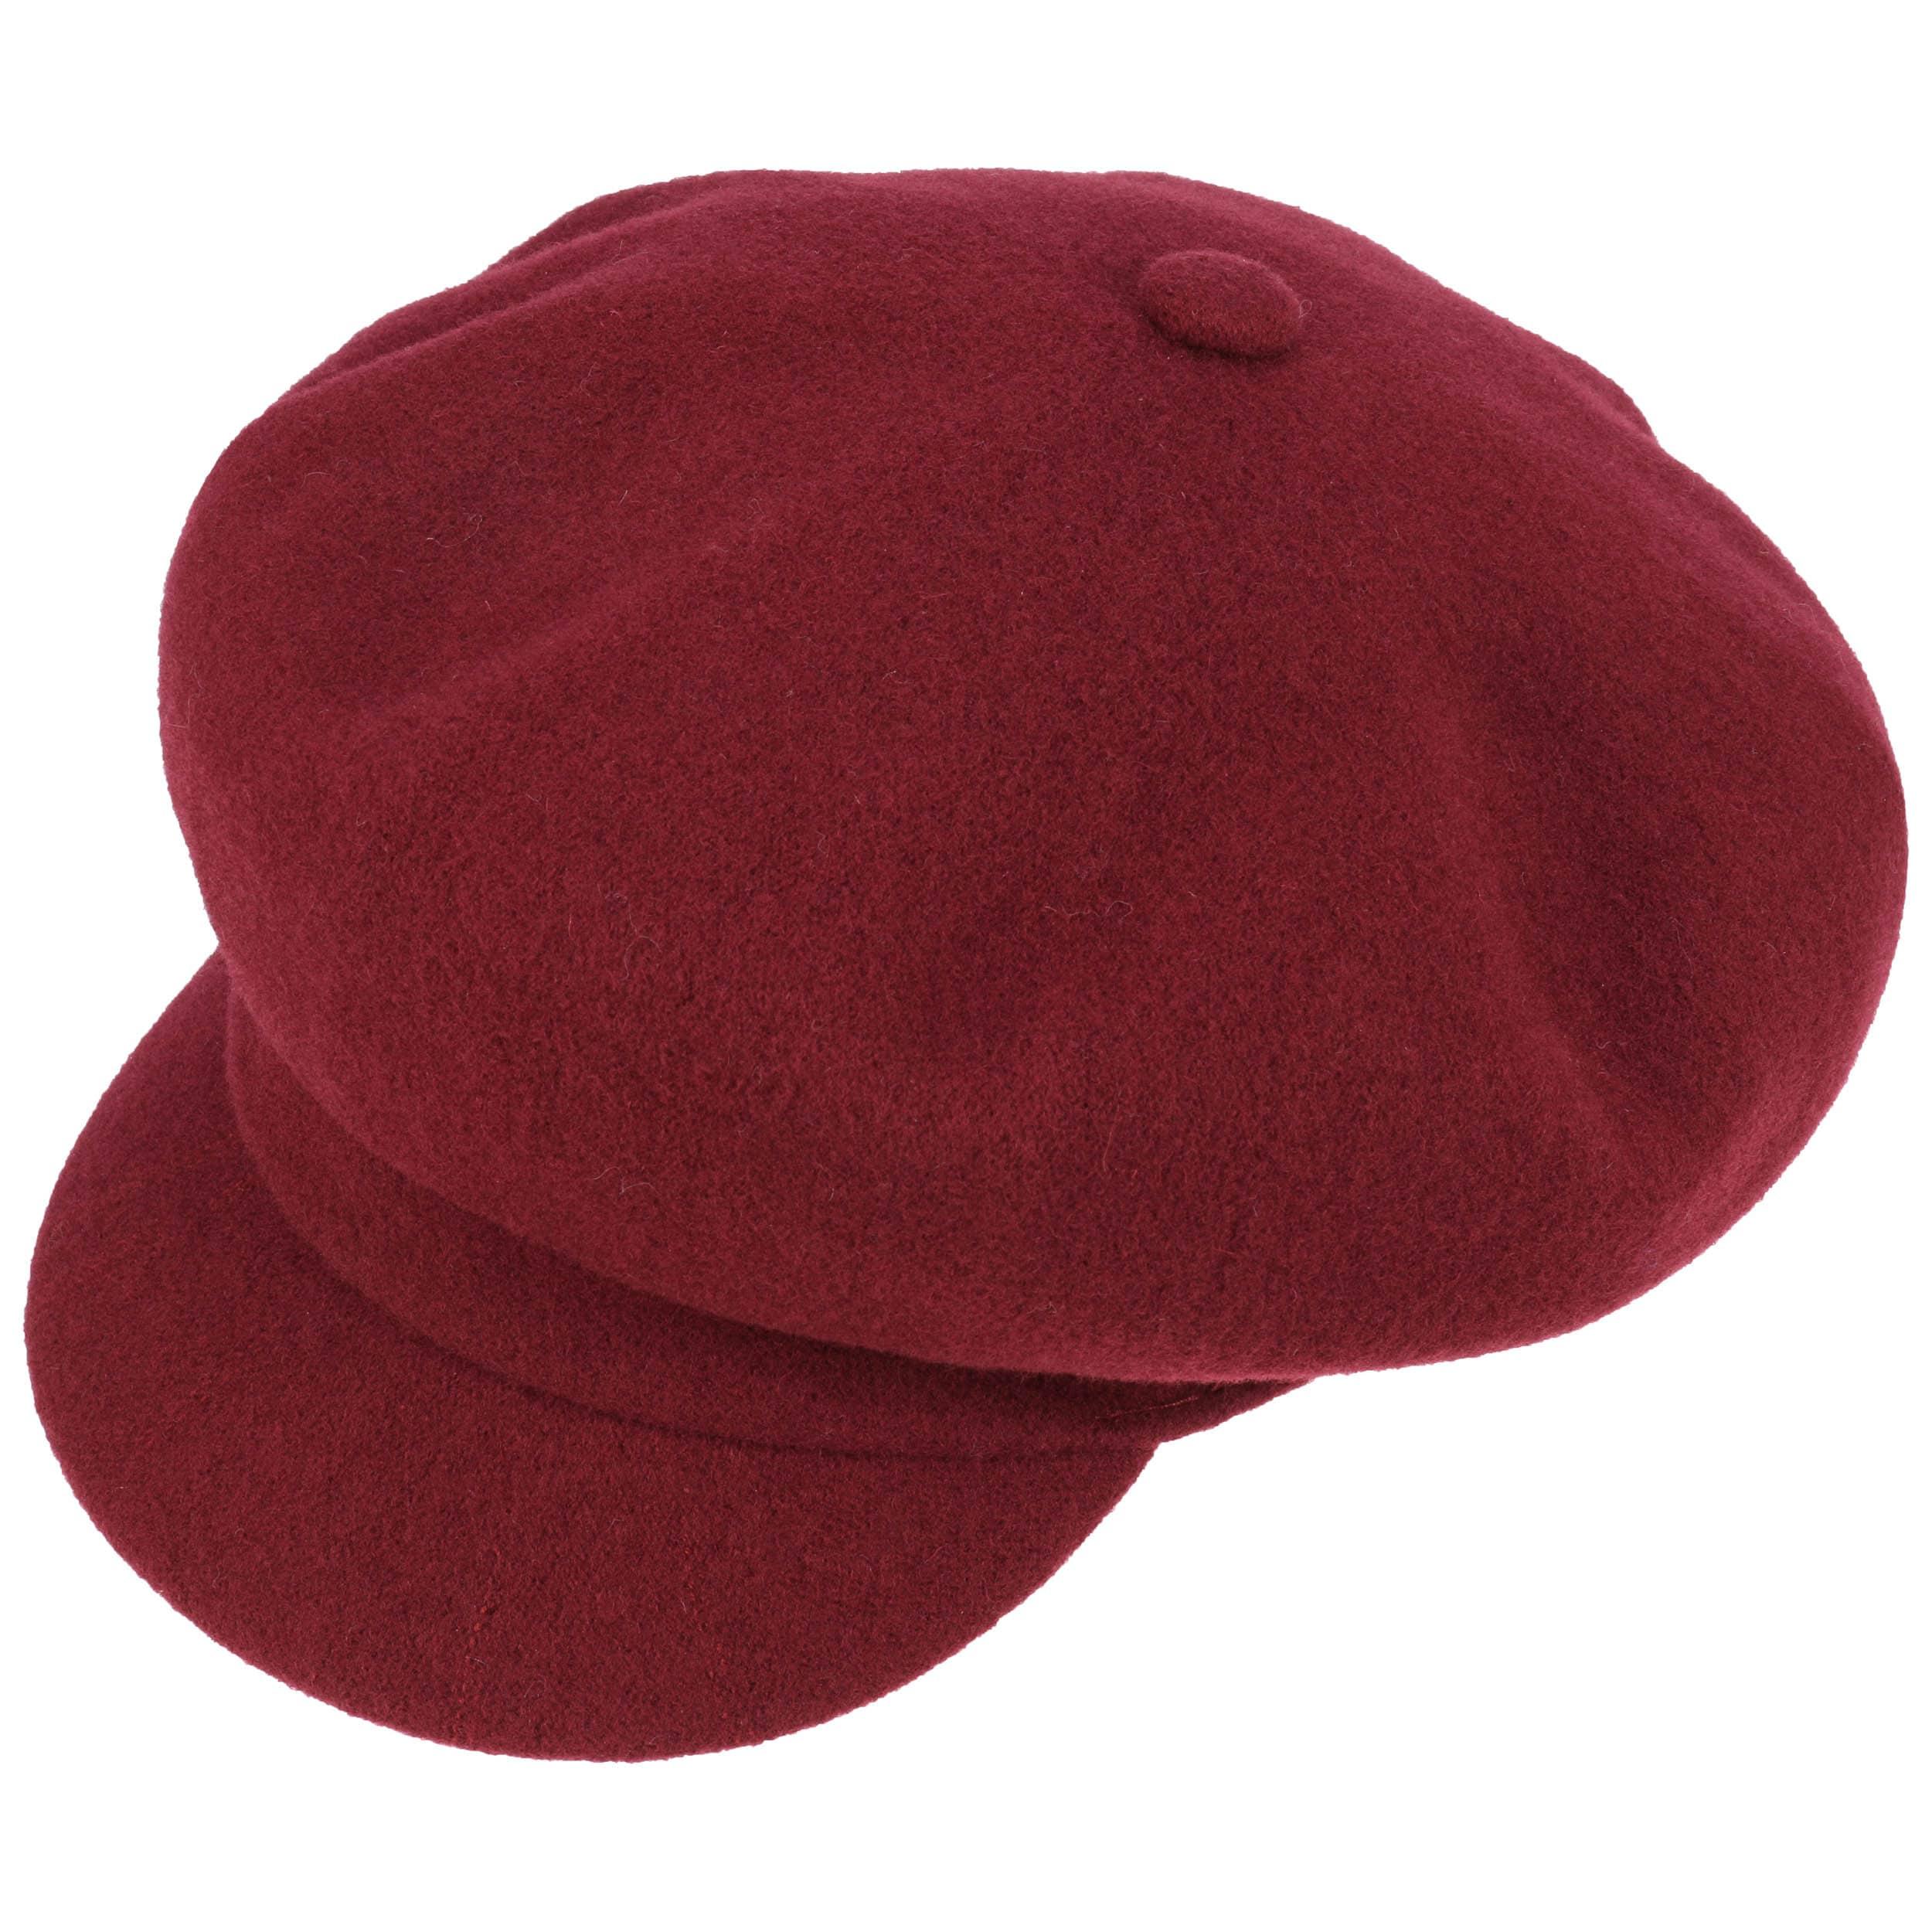 Wool Spitfire Newsboy Cap by Kangol - bordeaux 1 ... 9df641c2207